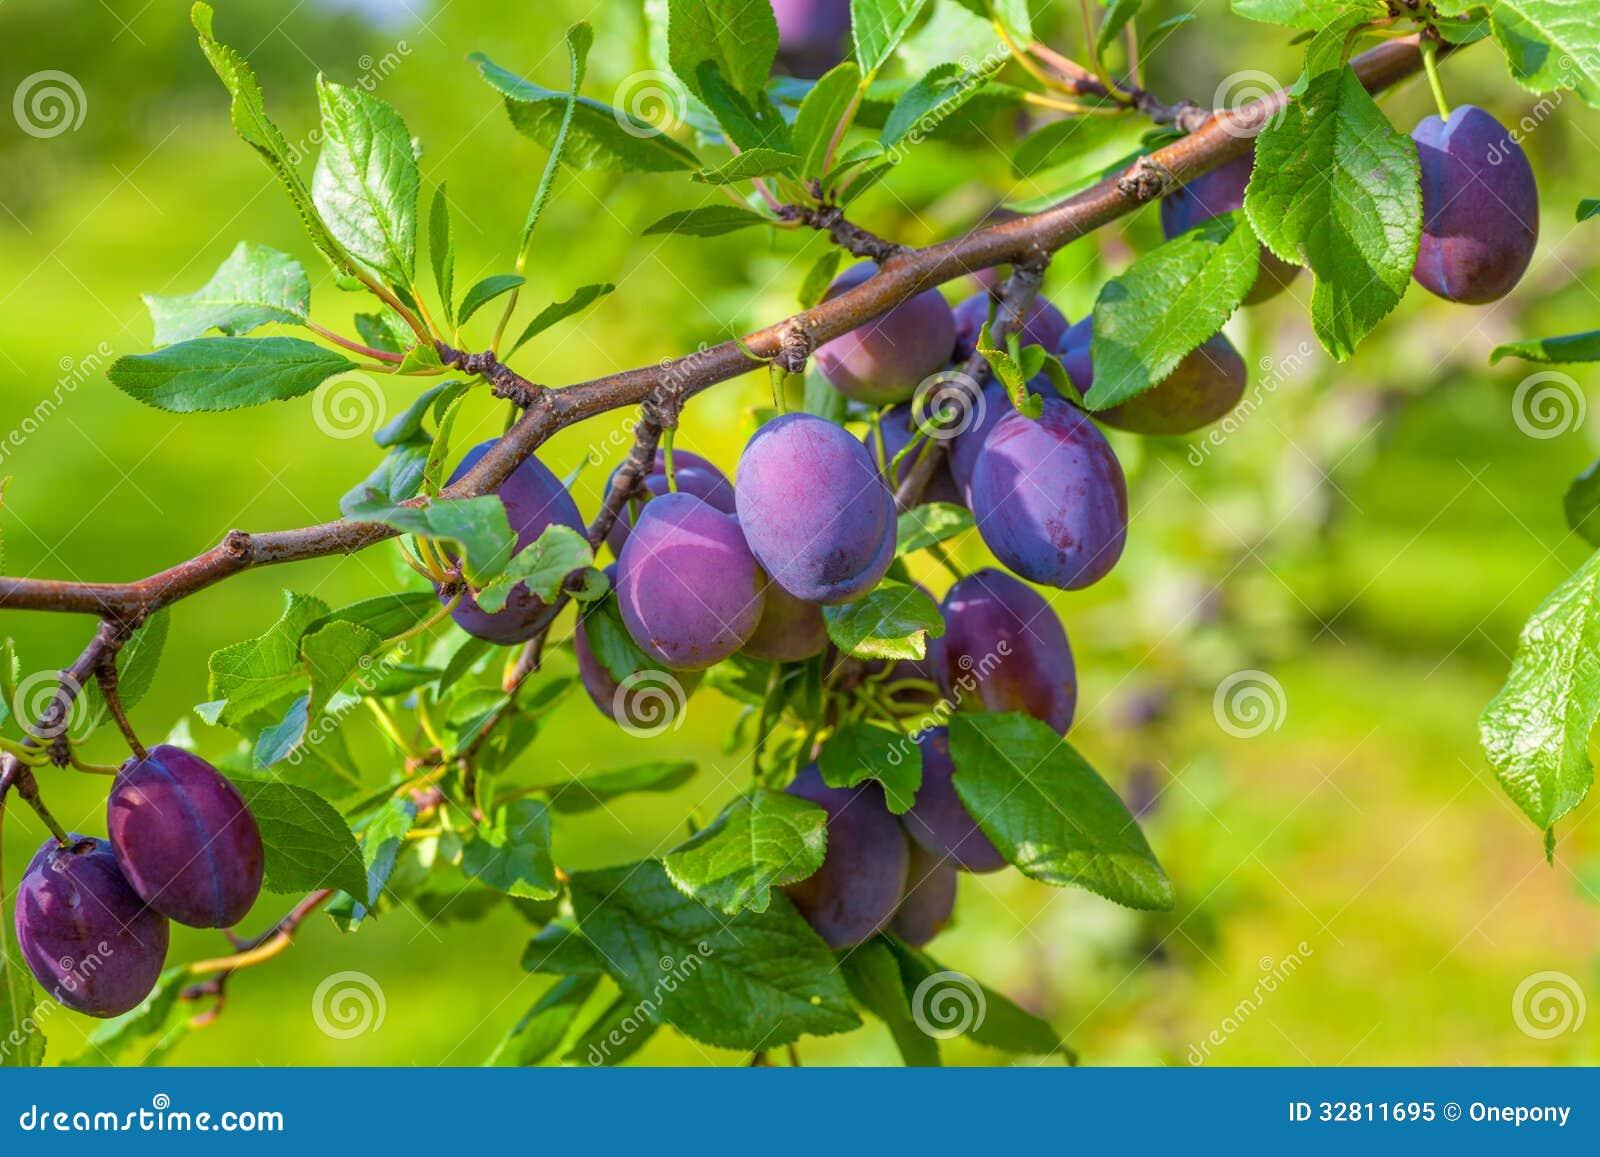 plum orchard royalty free stock photo image 32811695